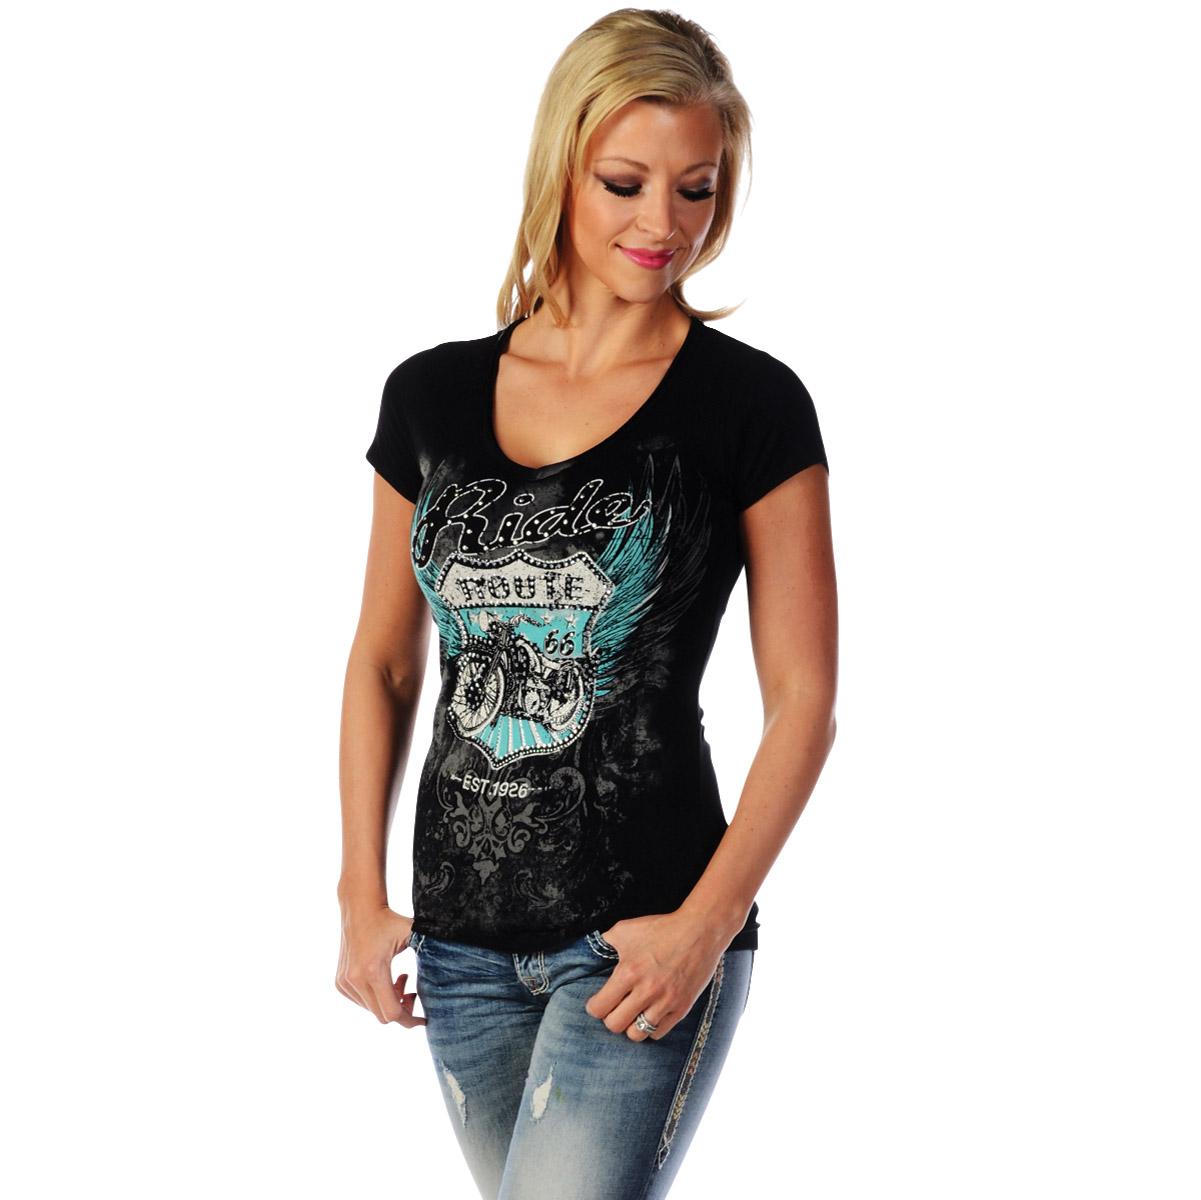 Liberty Wear Women S Route 66 Black V Neck T Shirt 7153 Lg